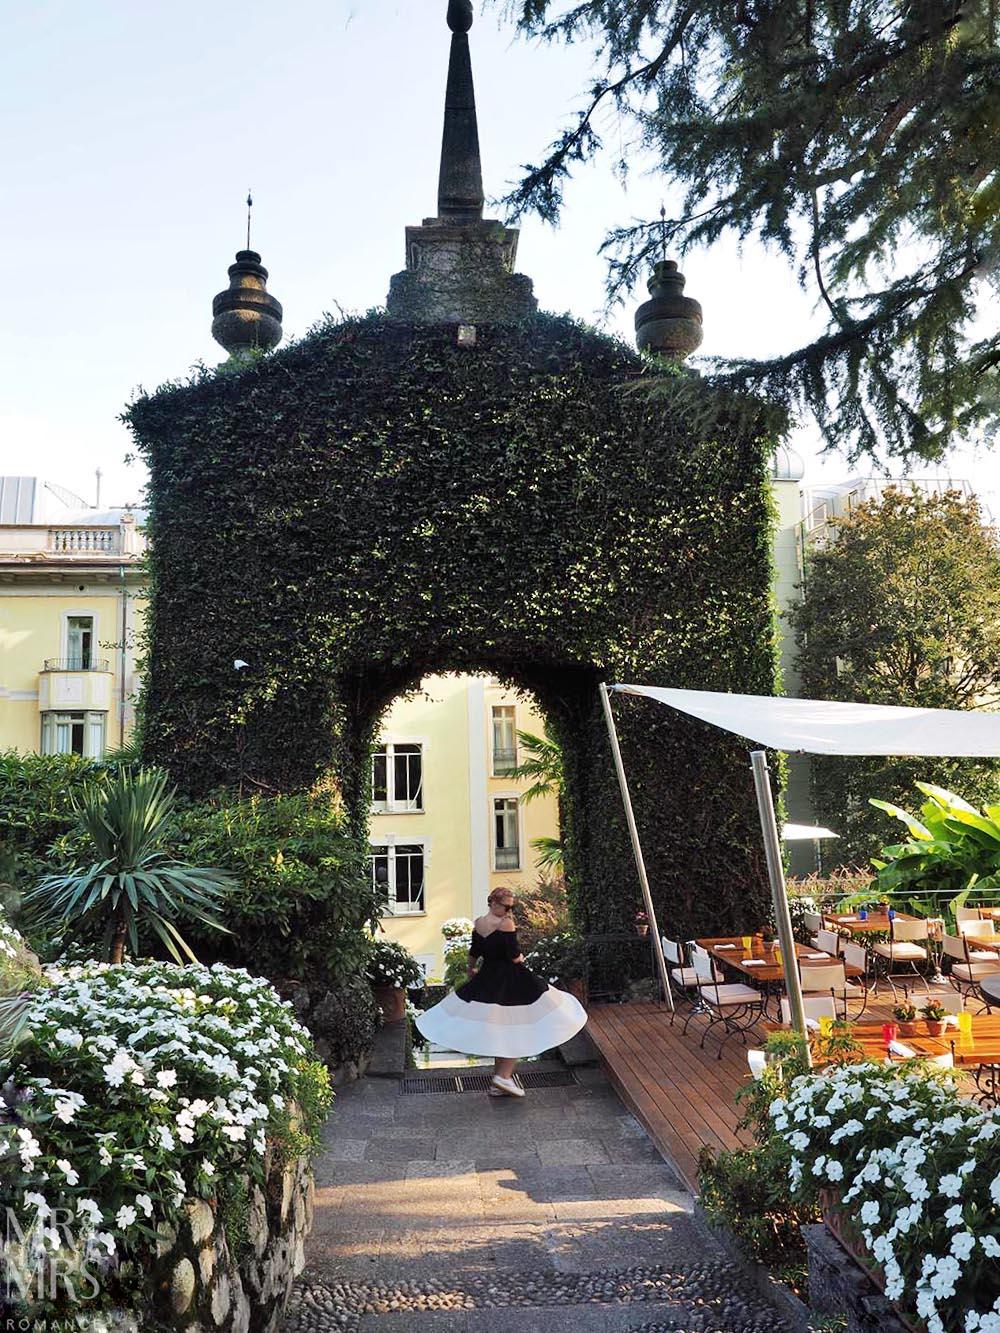 Grand Hotel Tremezzo Review - Where to stay Lake Como -